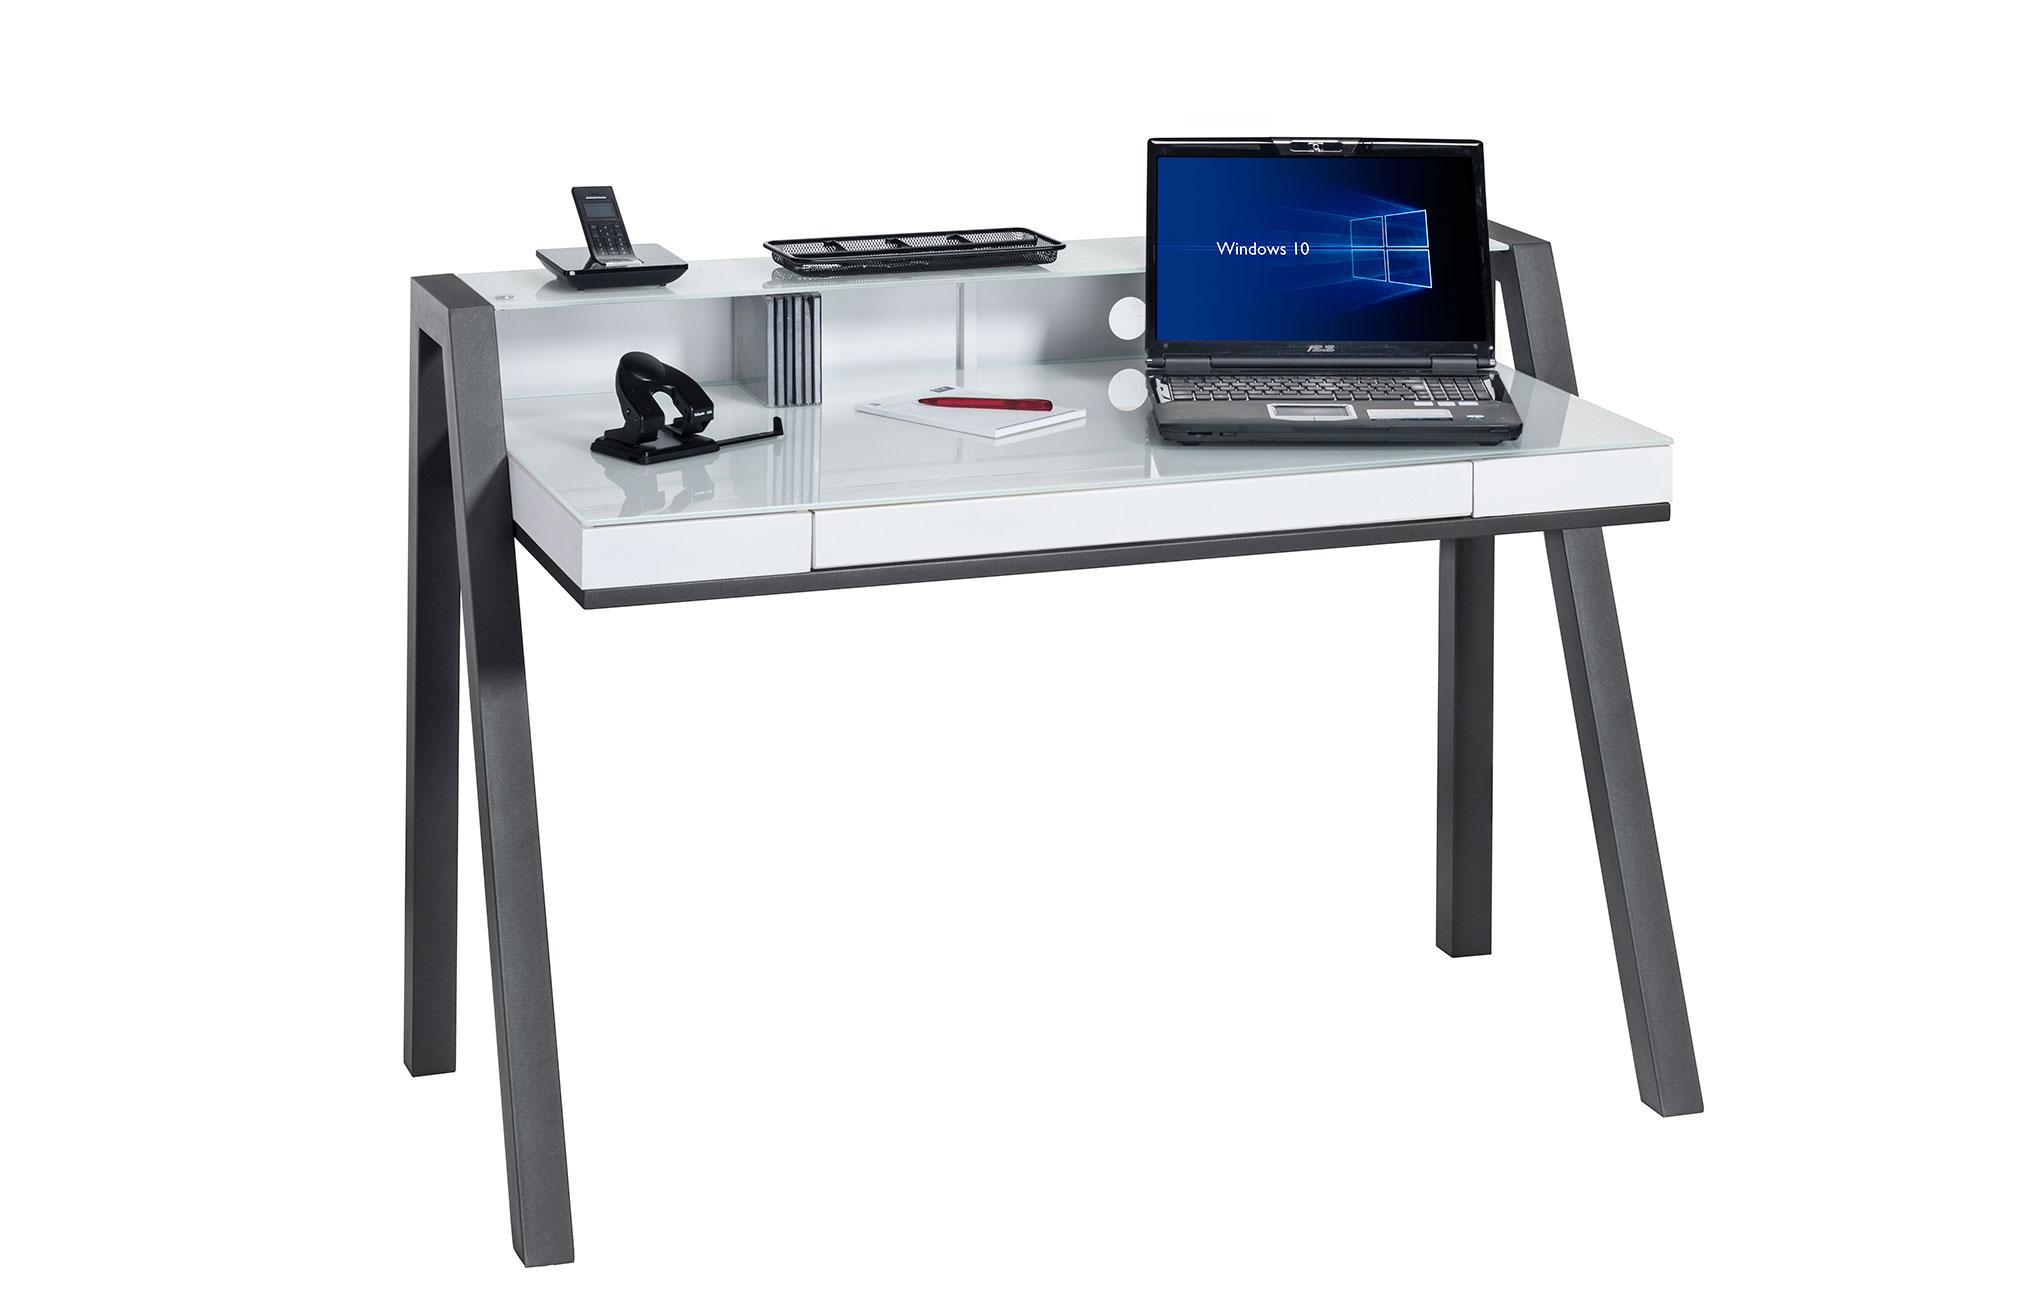 Bureau informatique design métal anthracite et verre blanc